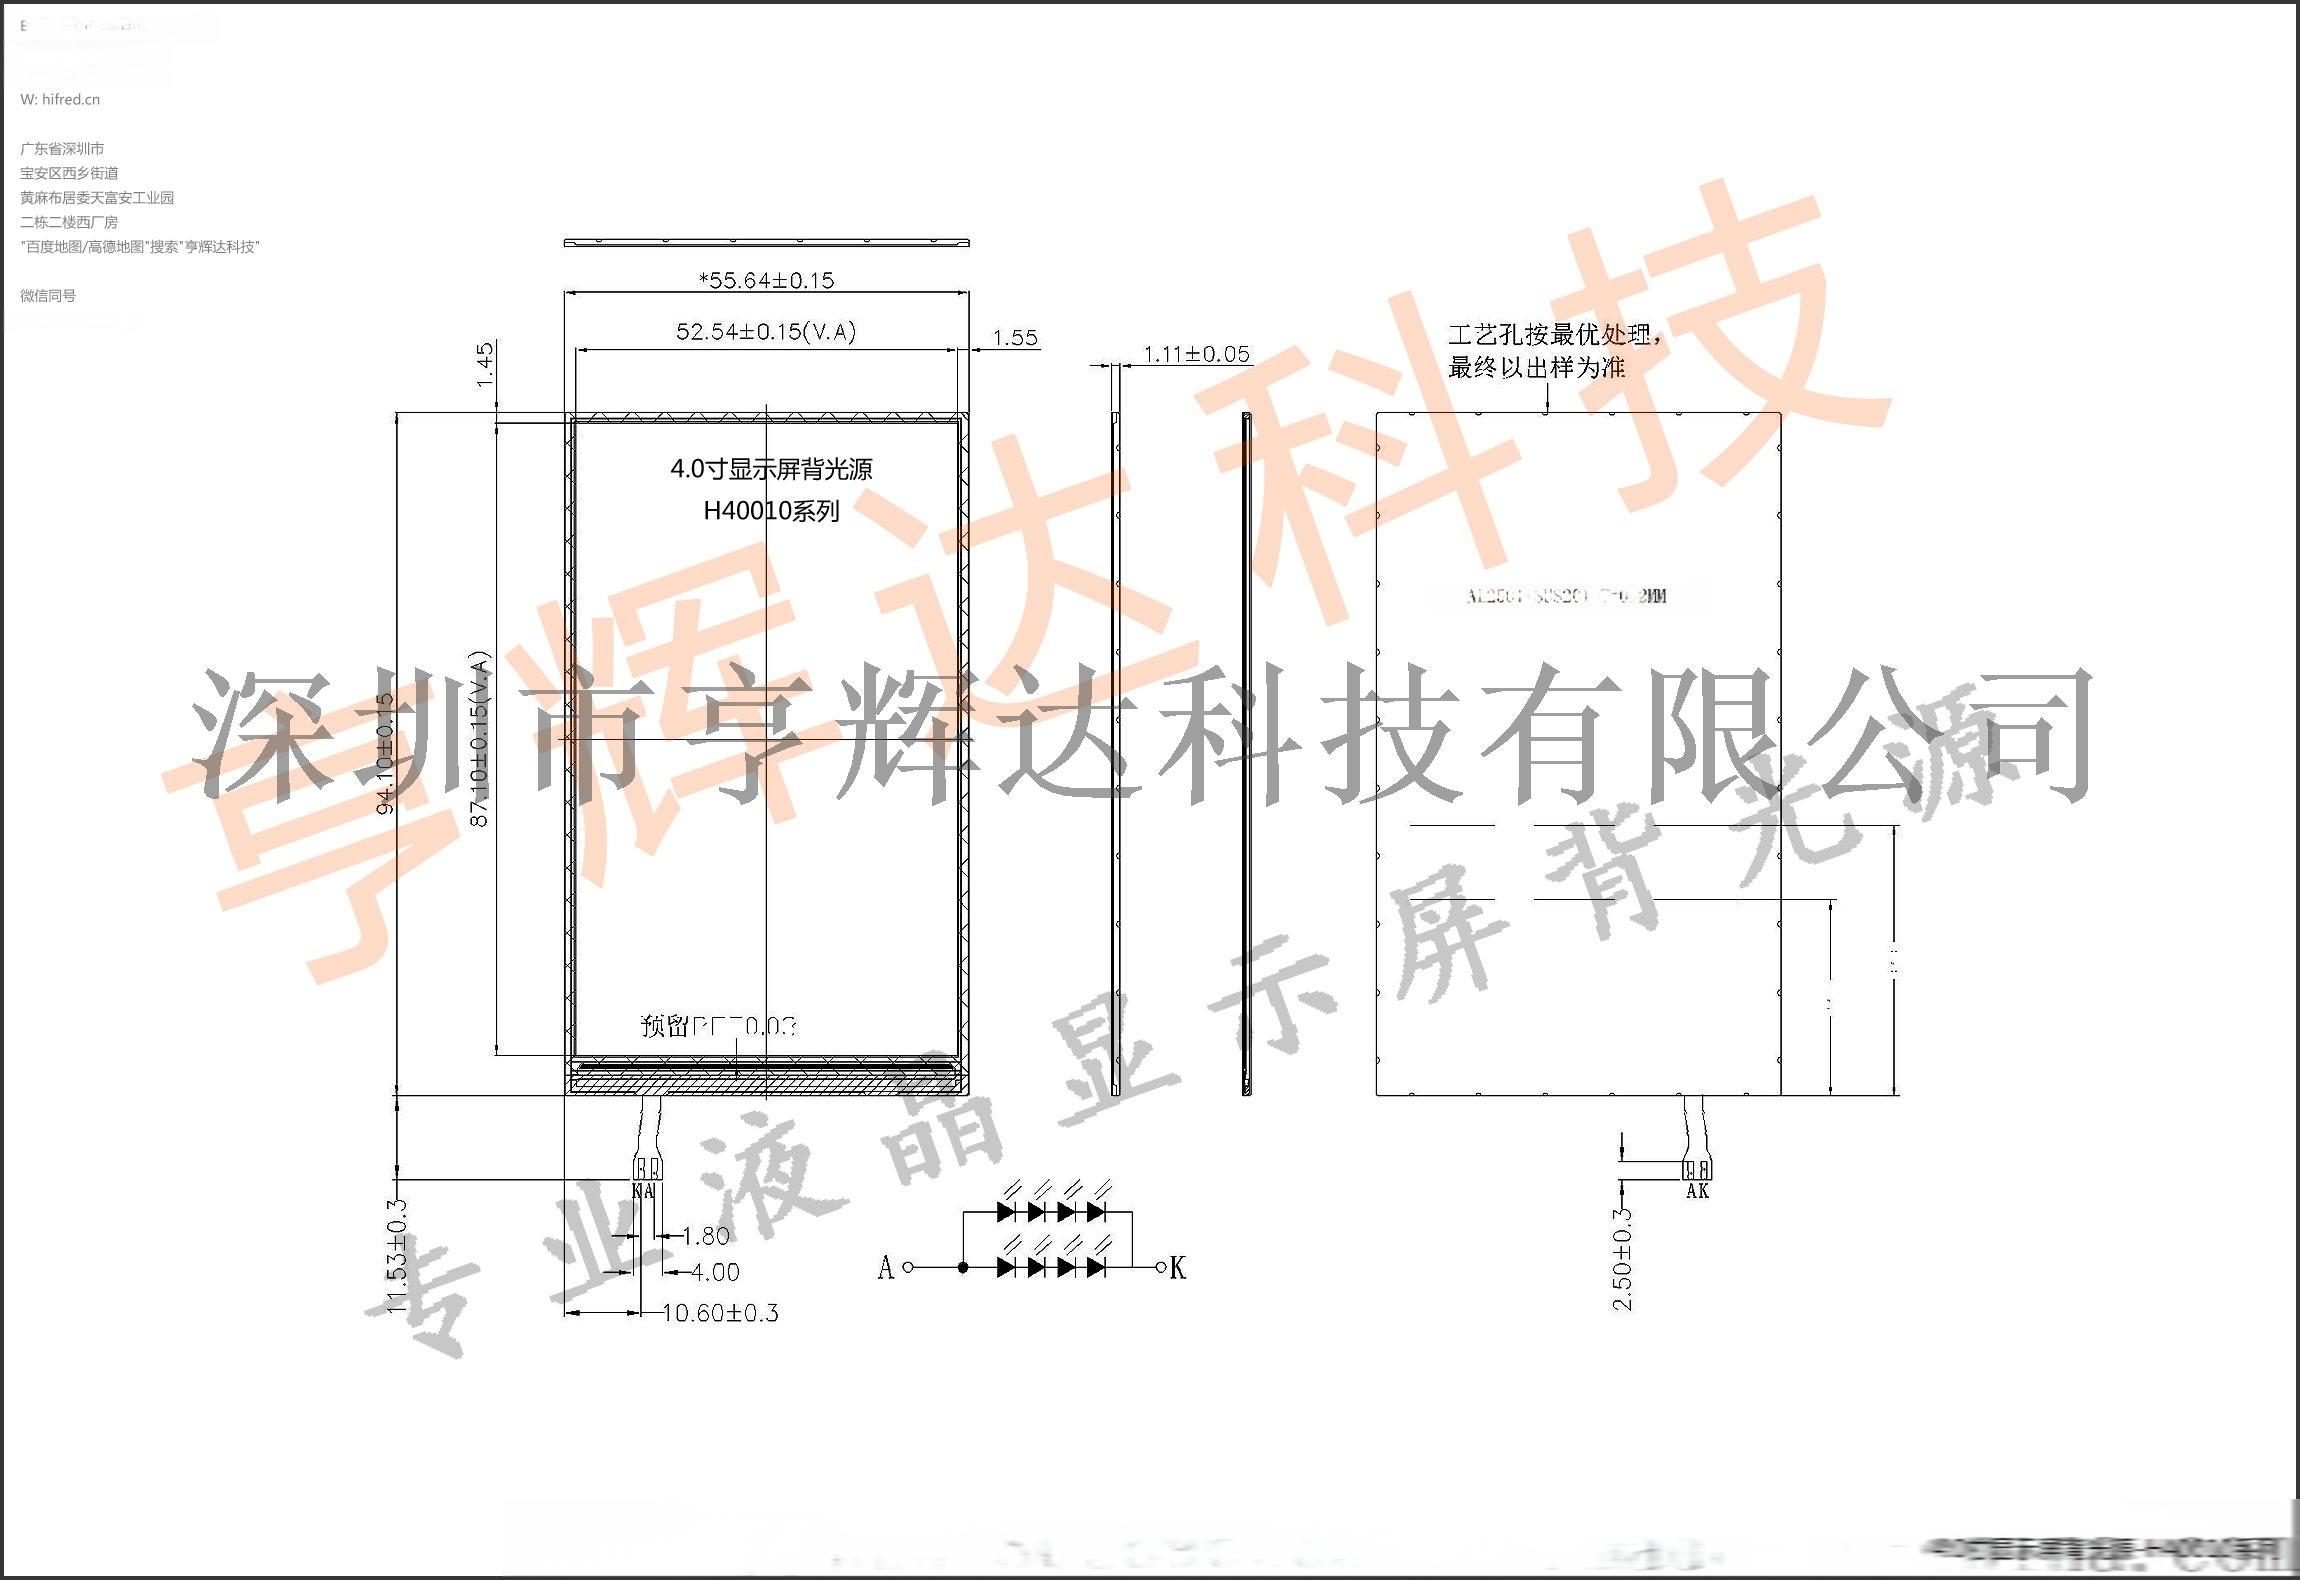 H40010A_pro.jpg